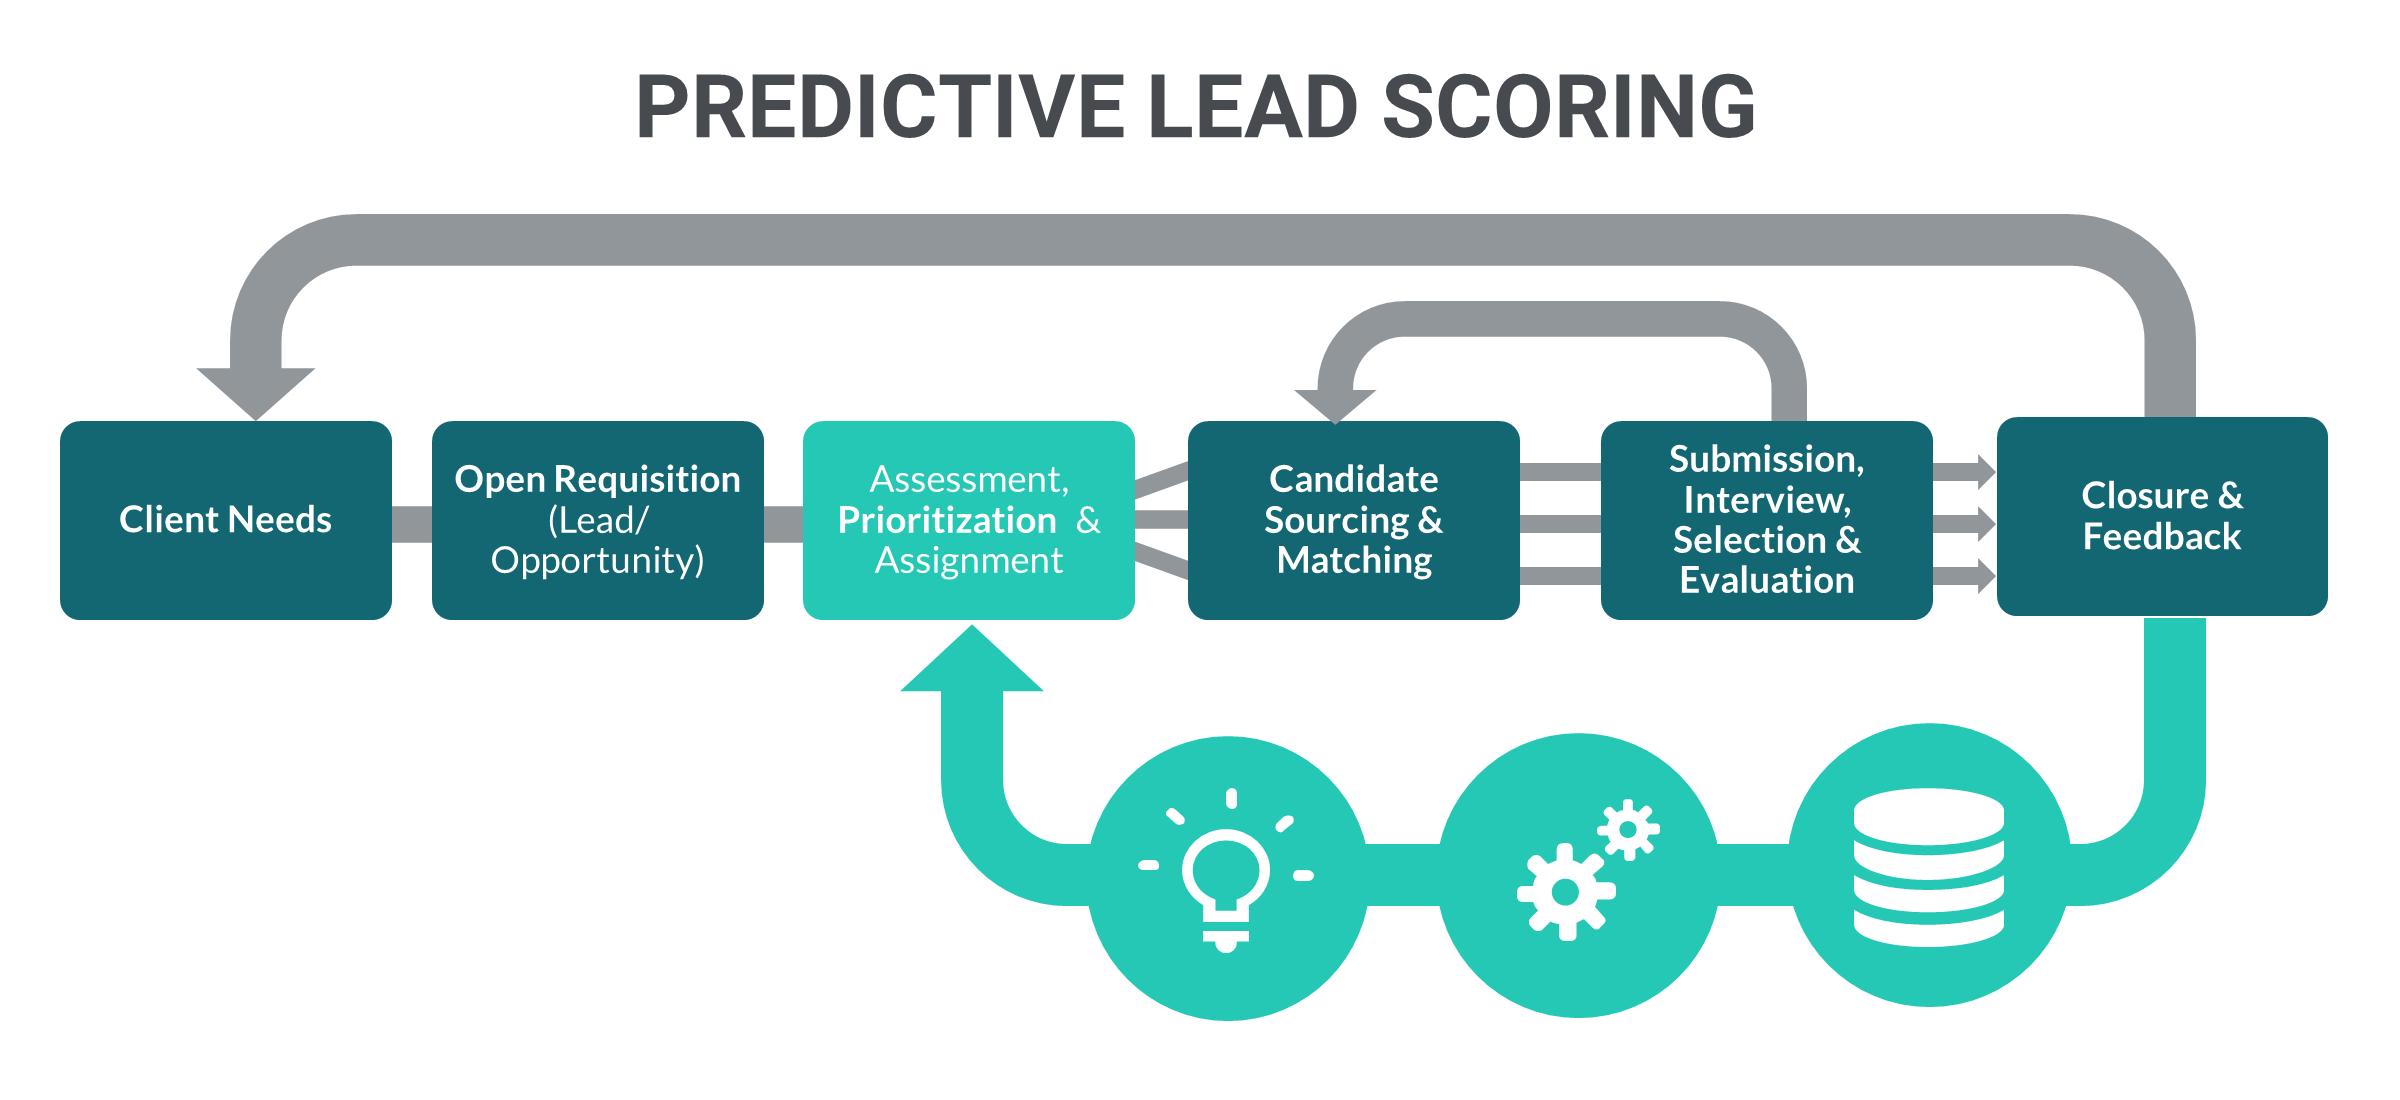 Lead prioritization with predictive analytics in recruitment ...